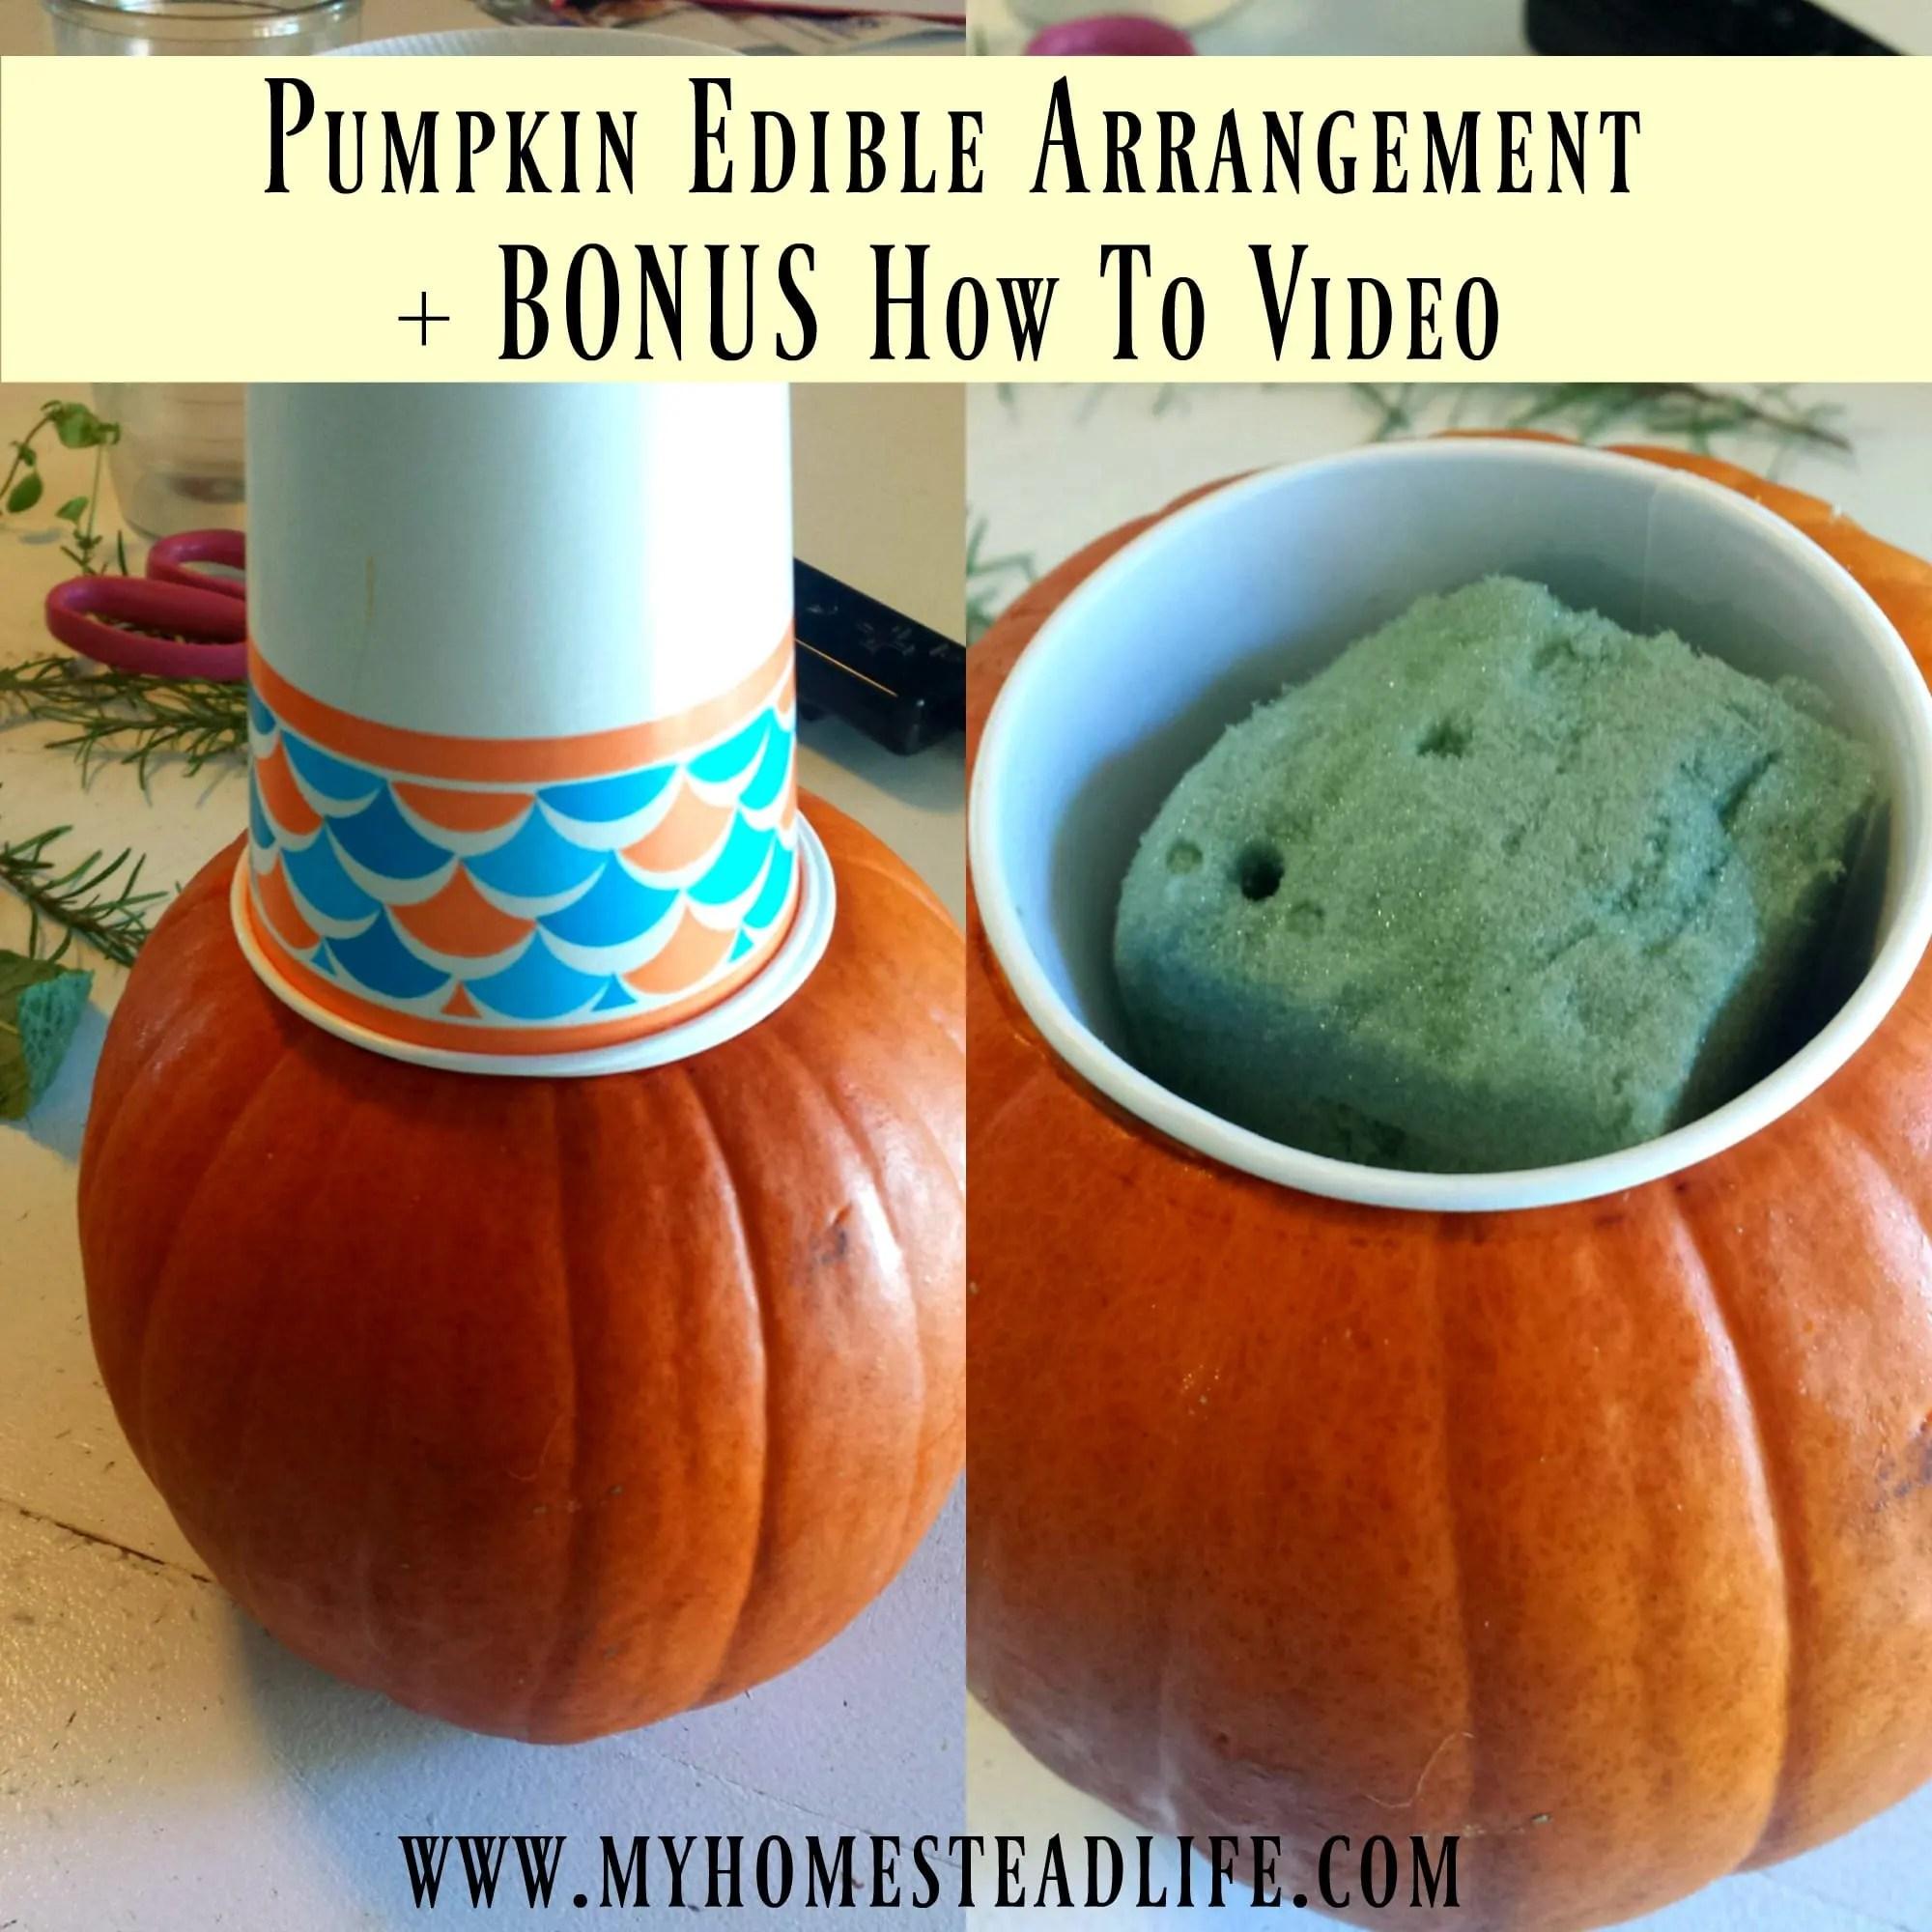 Pumpkin Edible Arrangement + BONUS Video